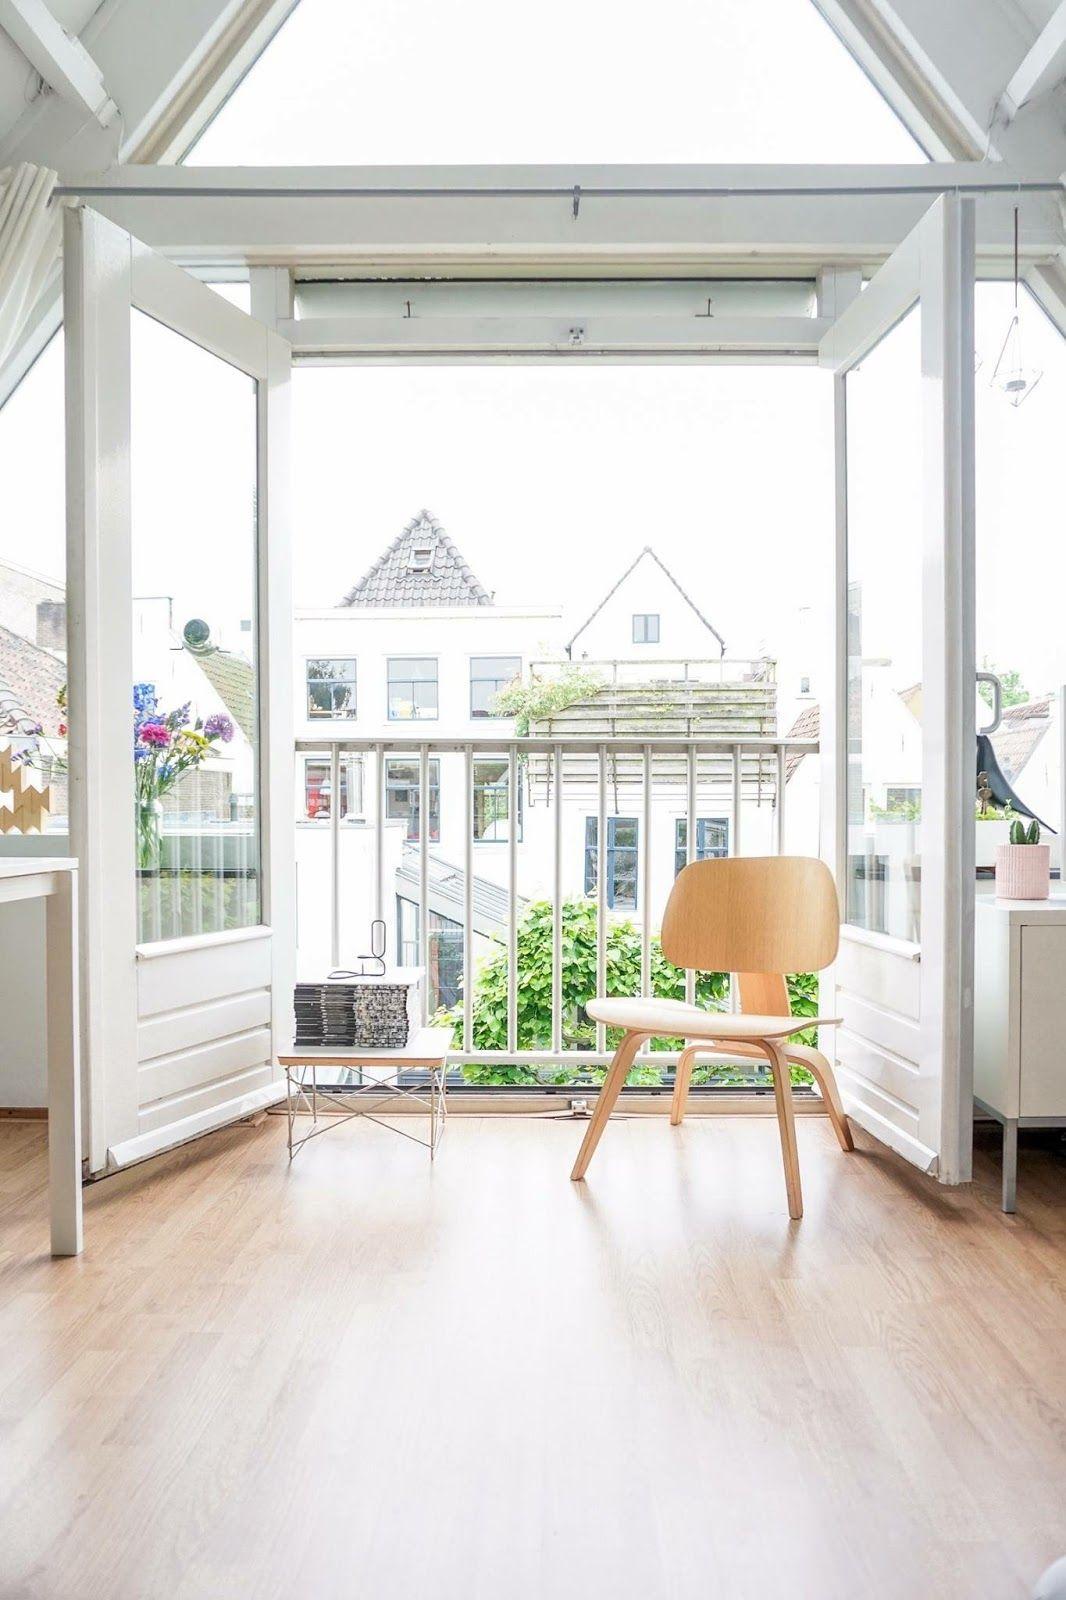 My home on Stek Magazine | Nordic Days - by Flor Linckens | midtown ...